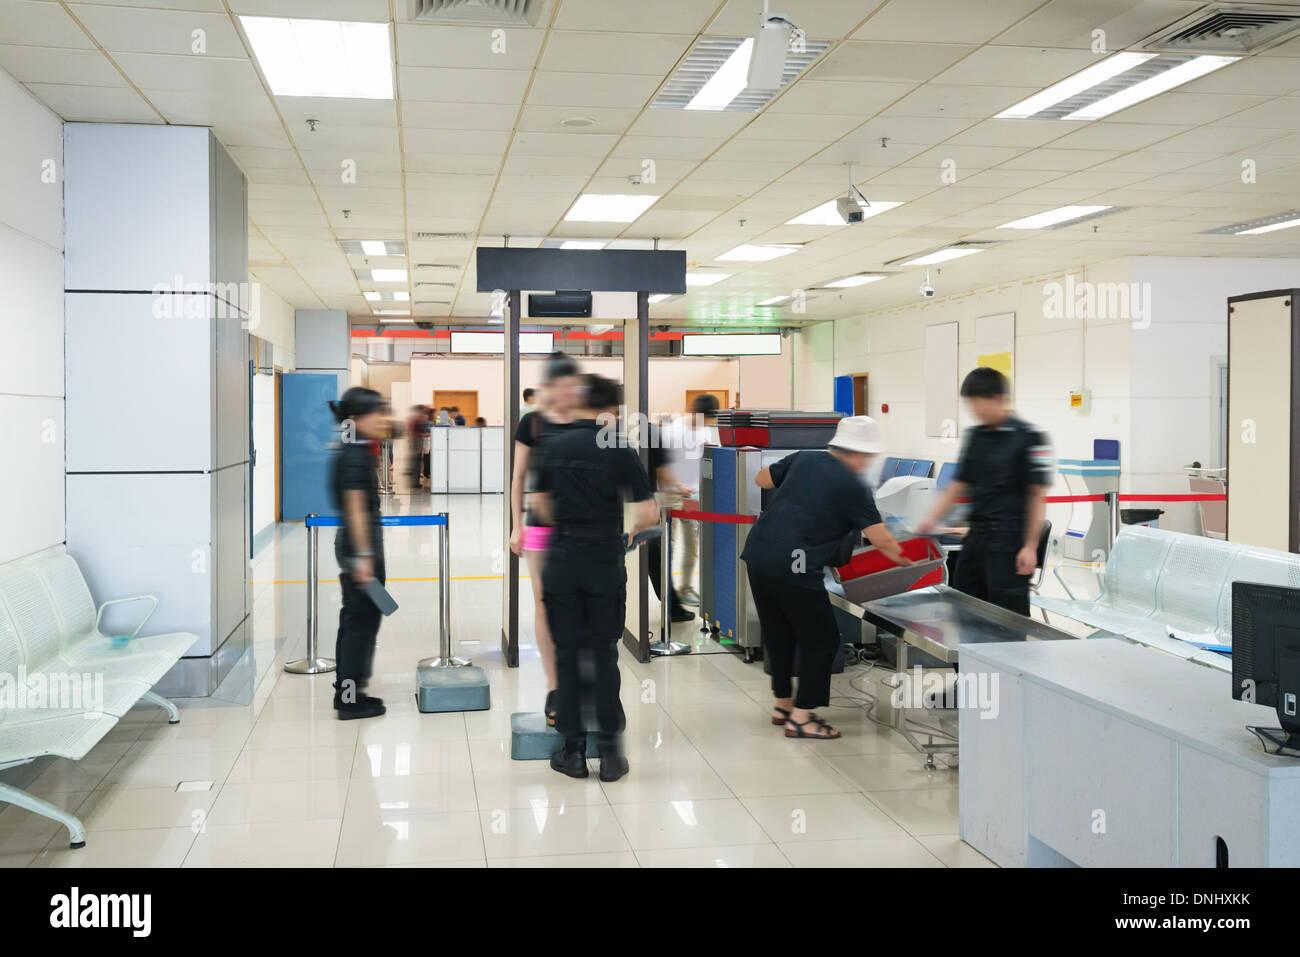 Security metal detector school - Airport Security Check With Passenger Walking Through Metal Detector Stock Image